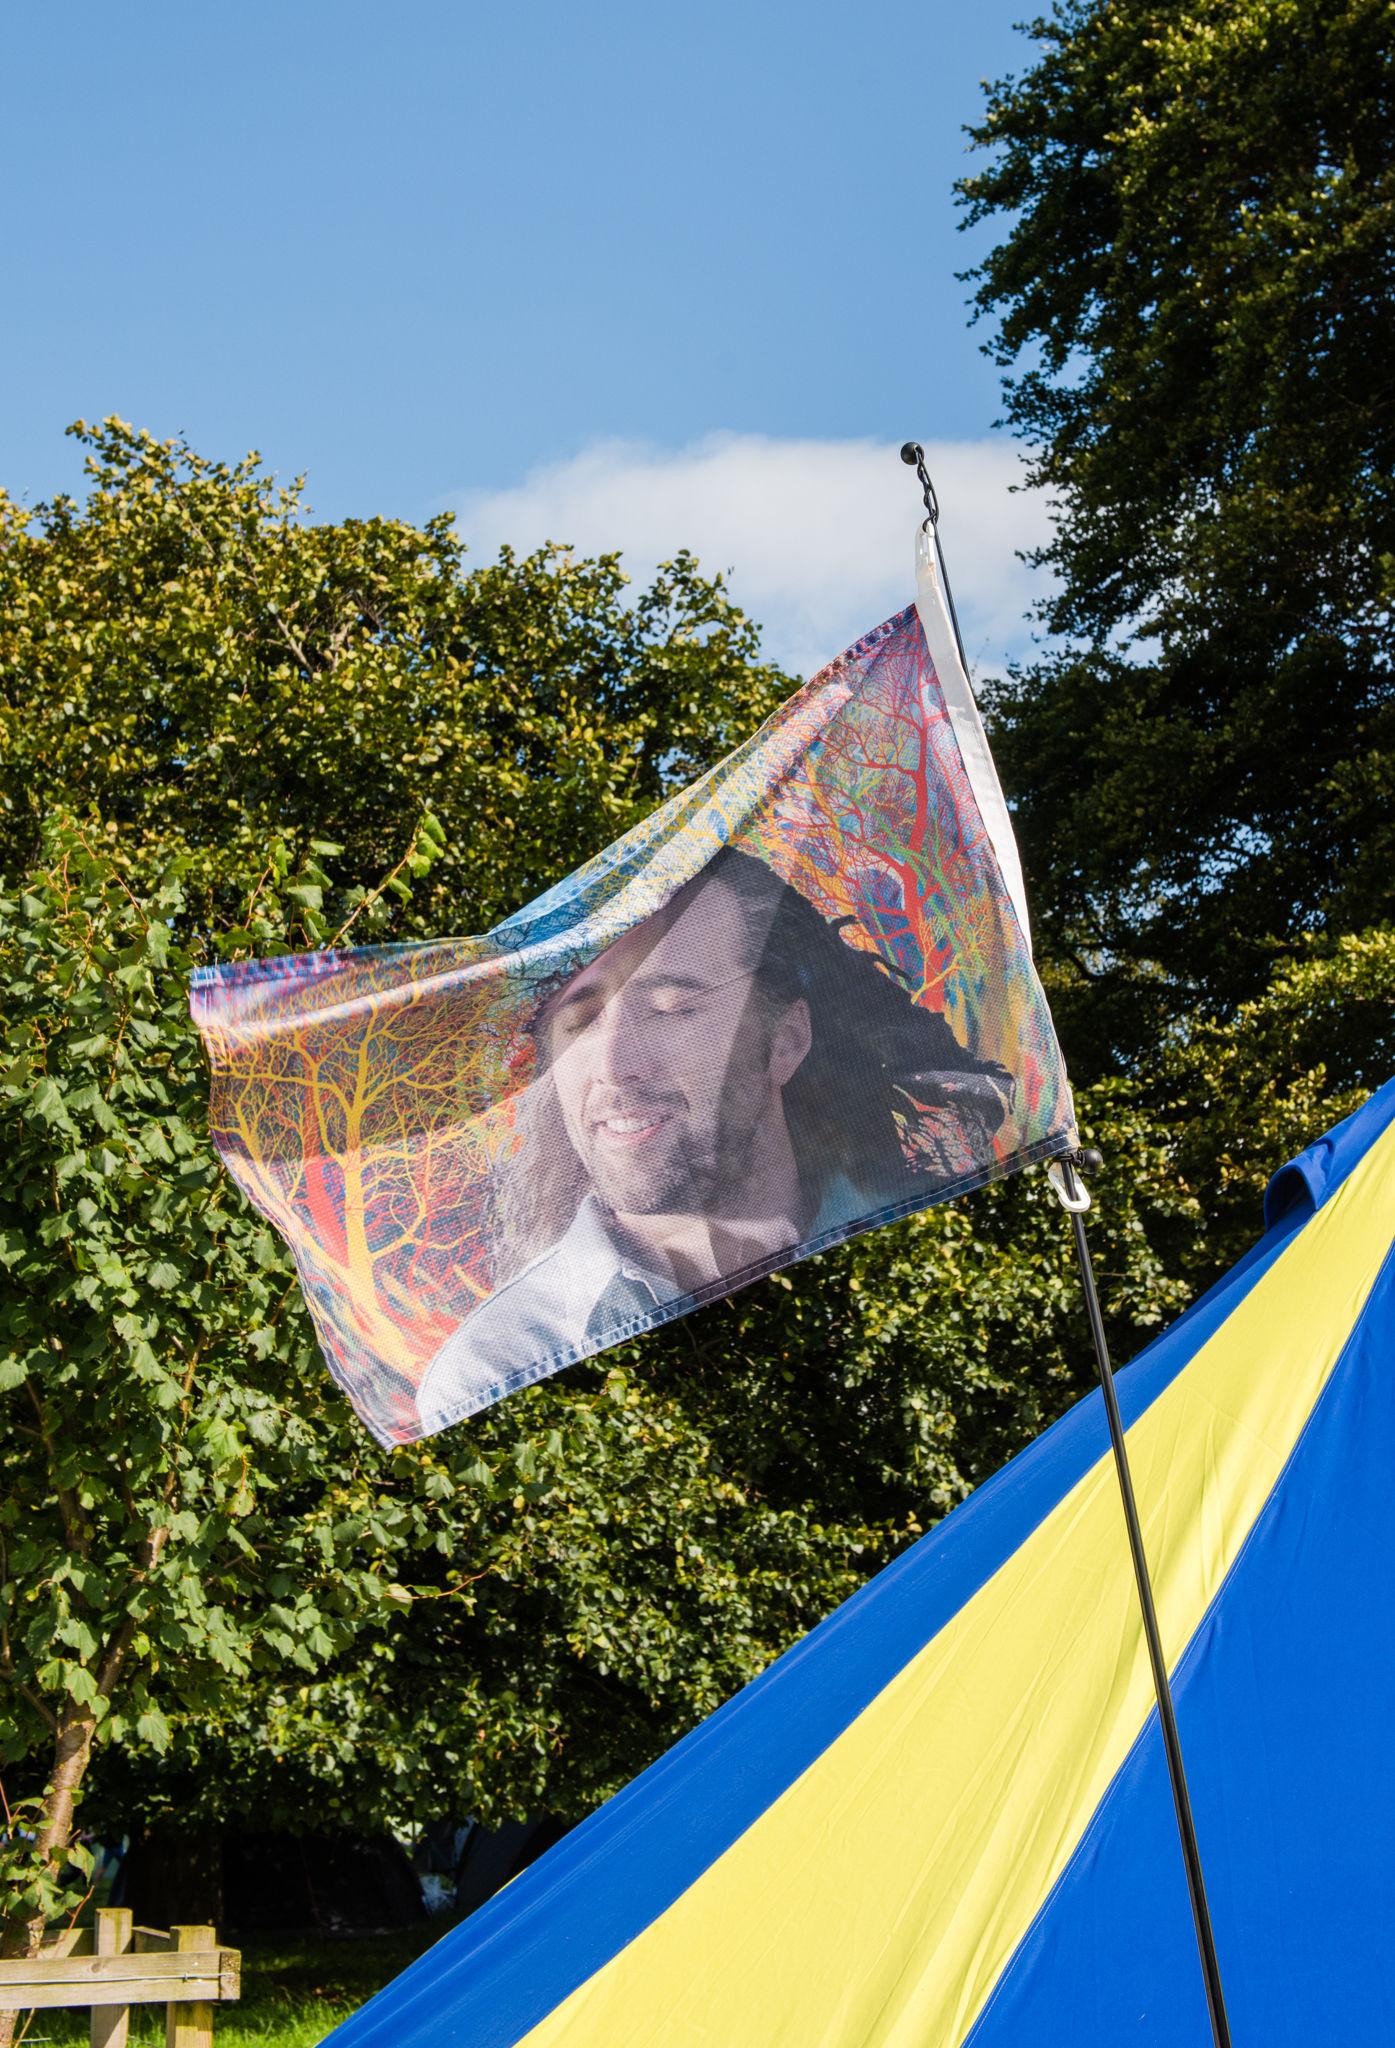 Festival Hacks Leeds Campsite Flag